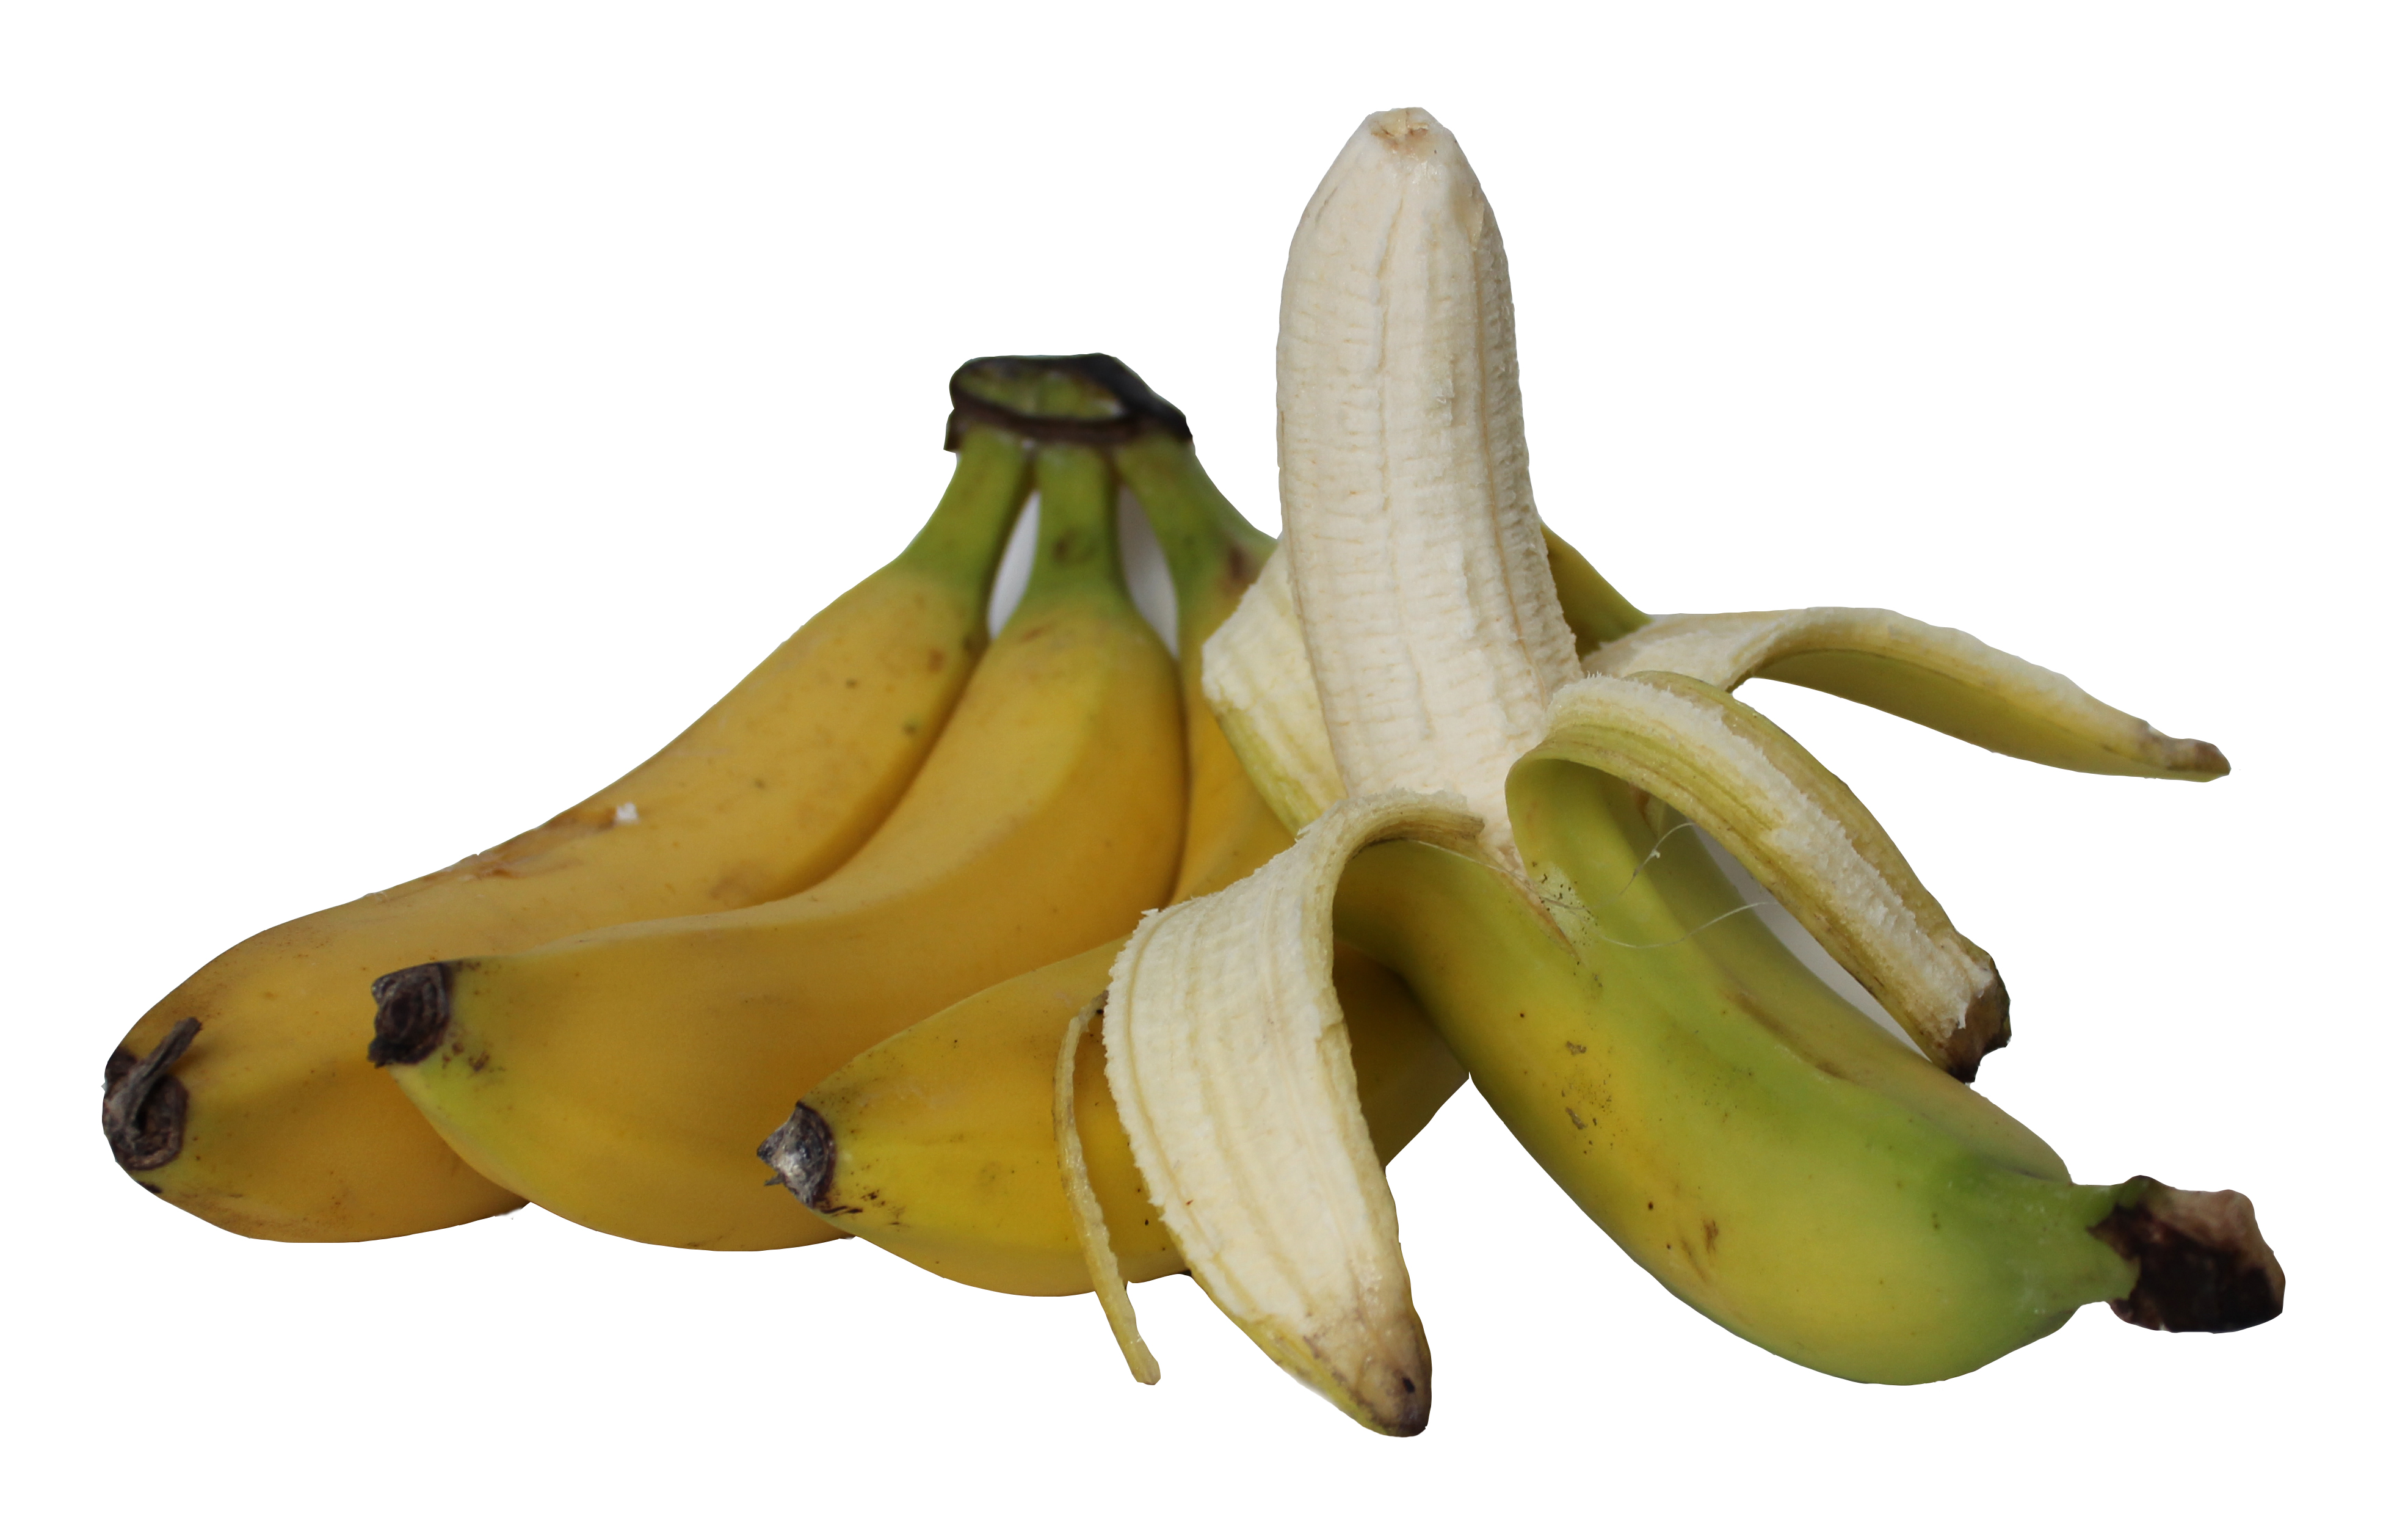 ethanol production from banana peels Kinetics studies on ethanol production from banana peel waste using mutant strain of saccharomyces cerevisiae pretreatment of banana peels.